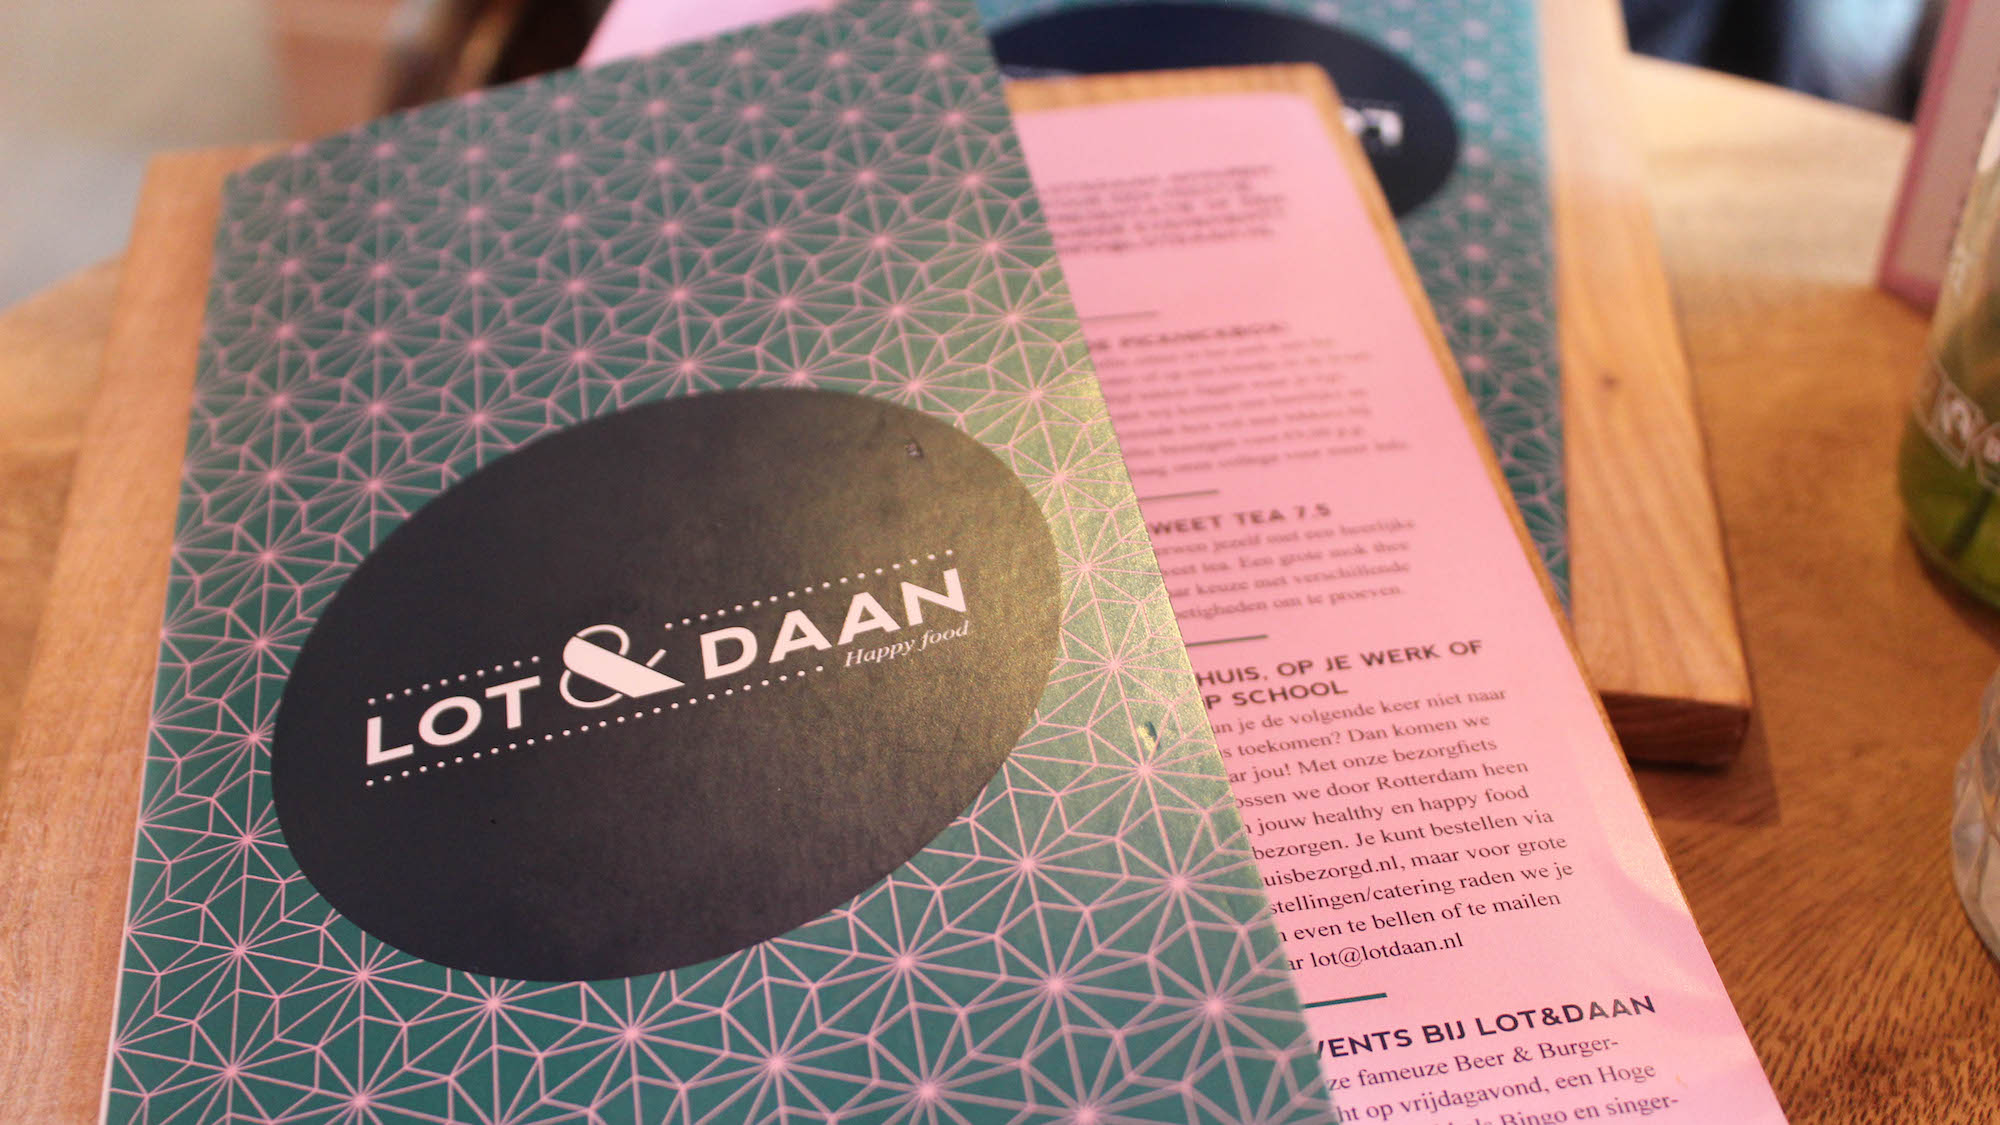 LOT&DAAN Rotterdam